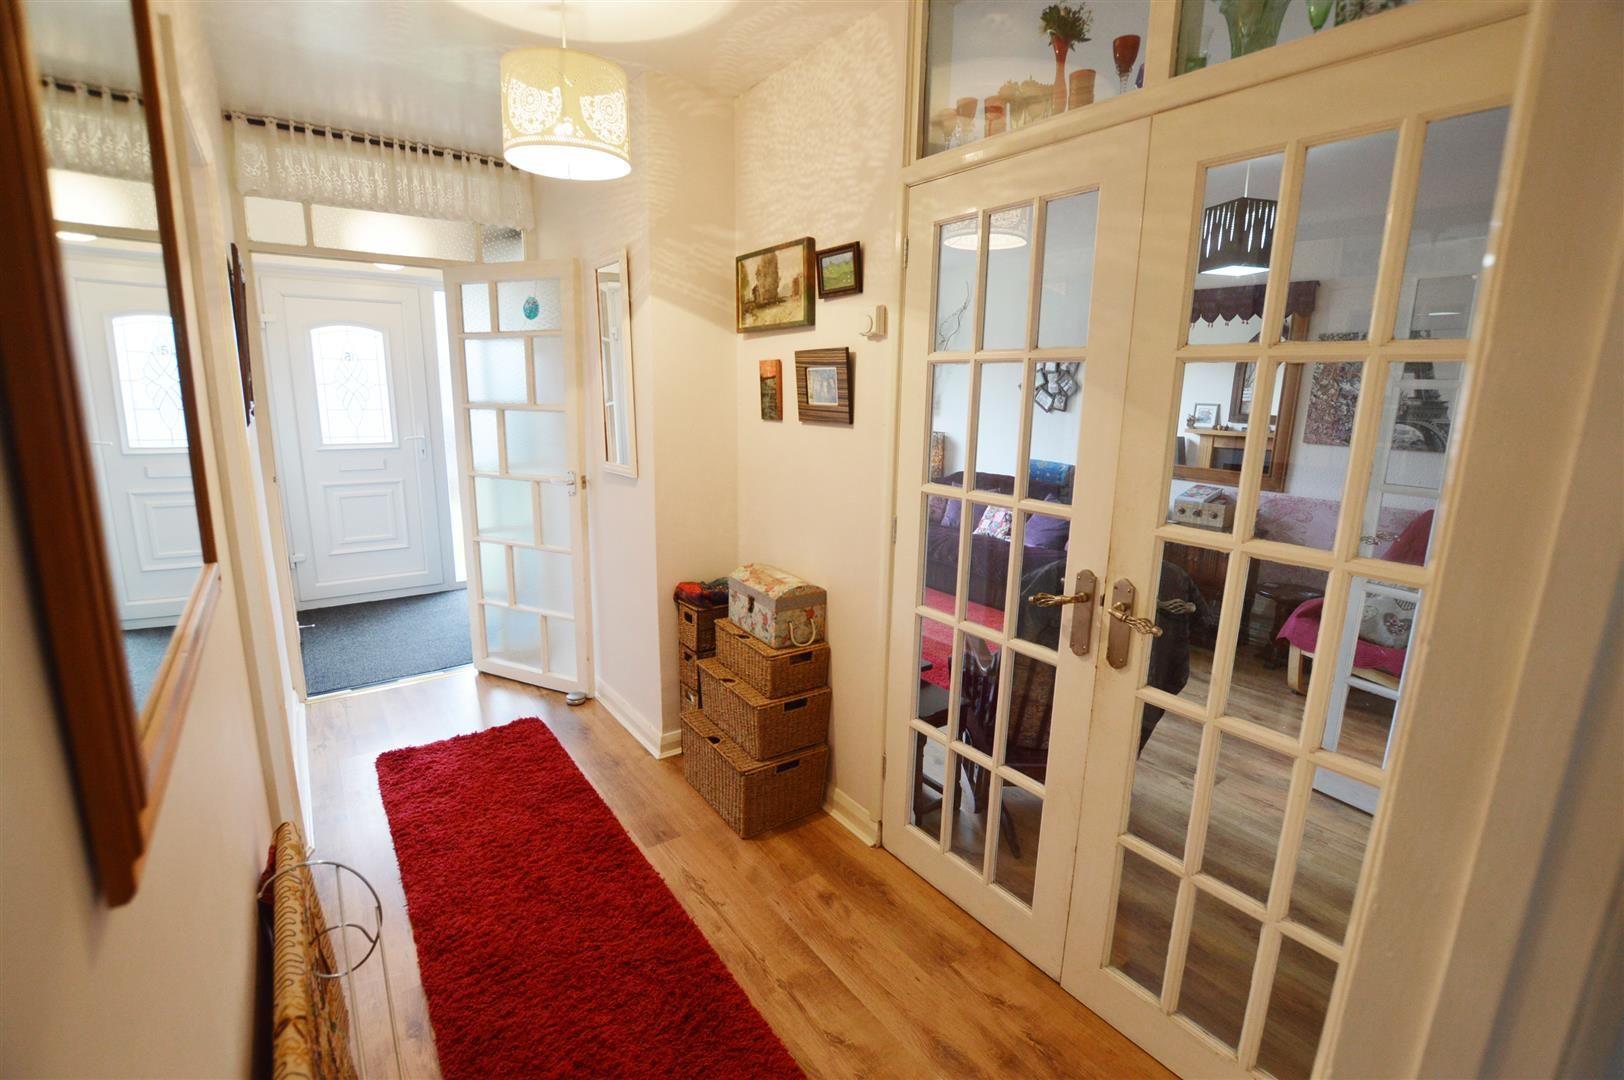 3 bed semi-detached-bungalow for sale in Shobdon 4